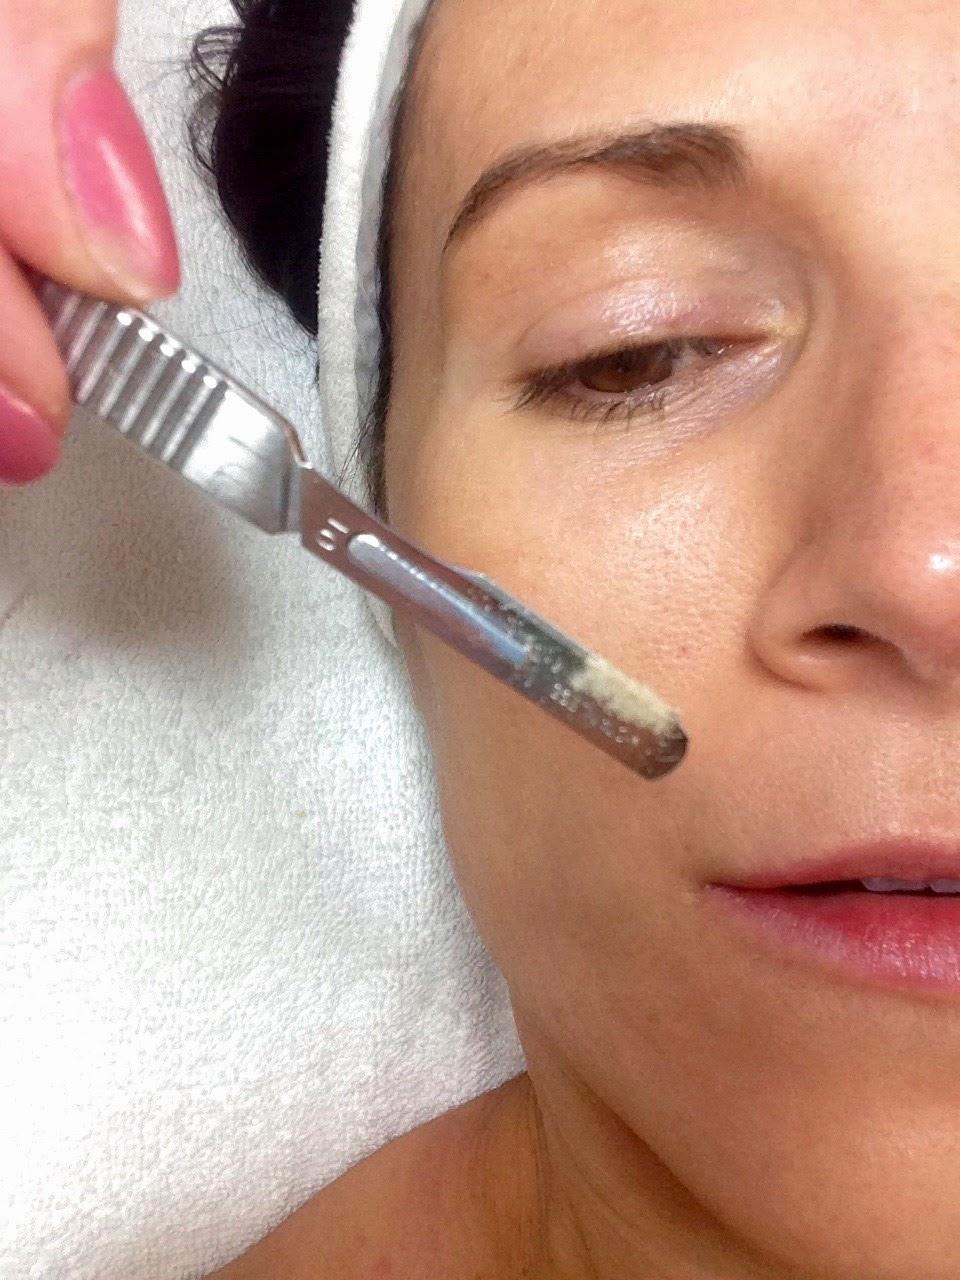 Dermaplaning, dermaplaning facials, dermaplaning reviews, dermaplaning costs, dermaplaning  side effects